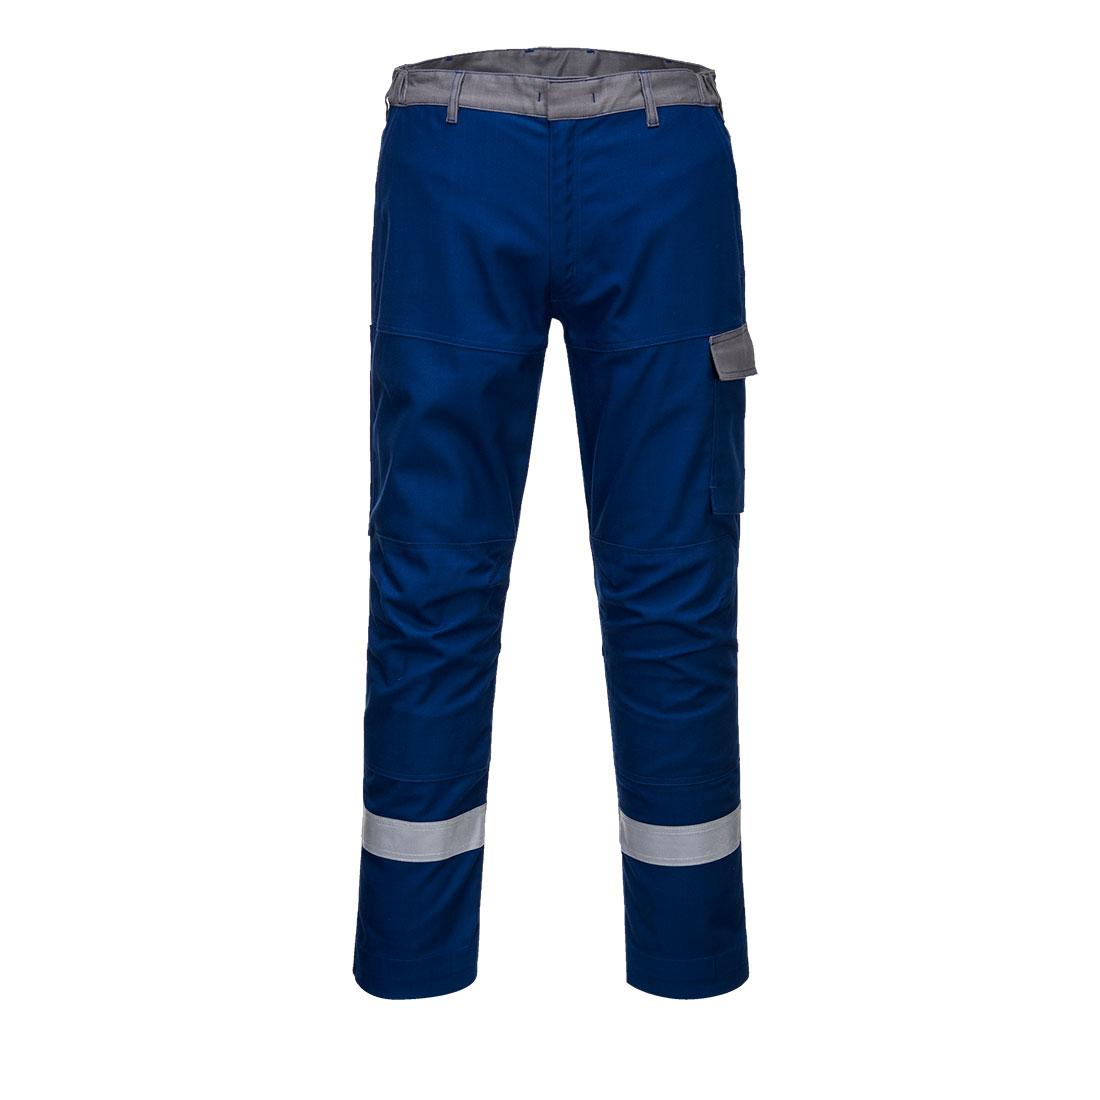 Bizflame Ultra Trousers Royal Blue 46